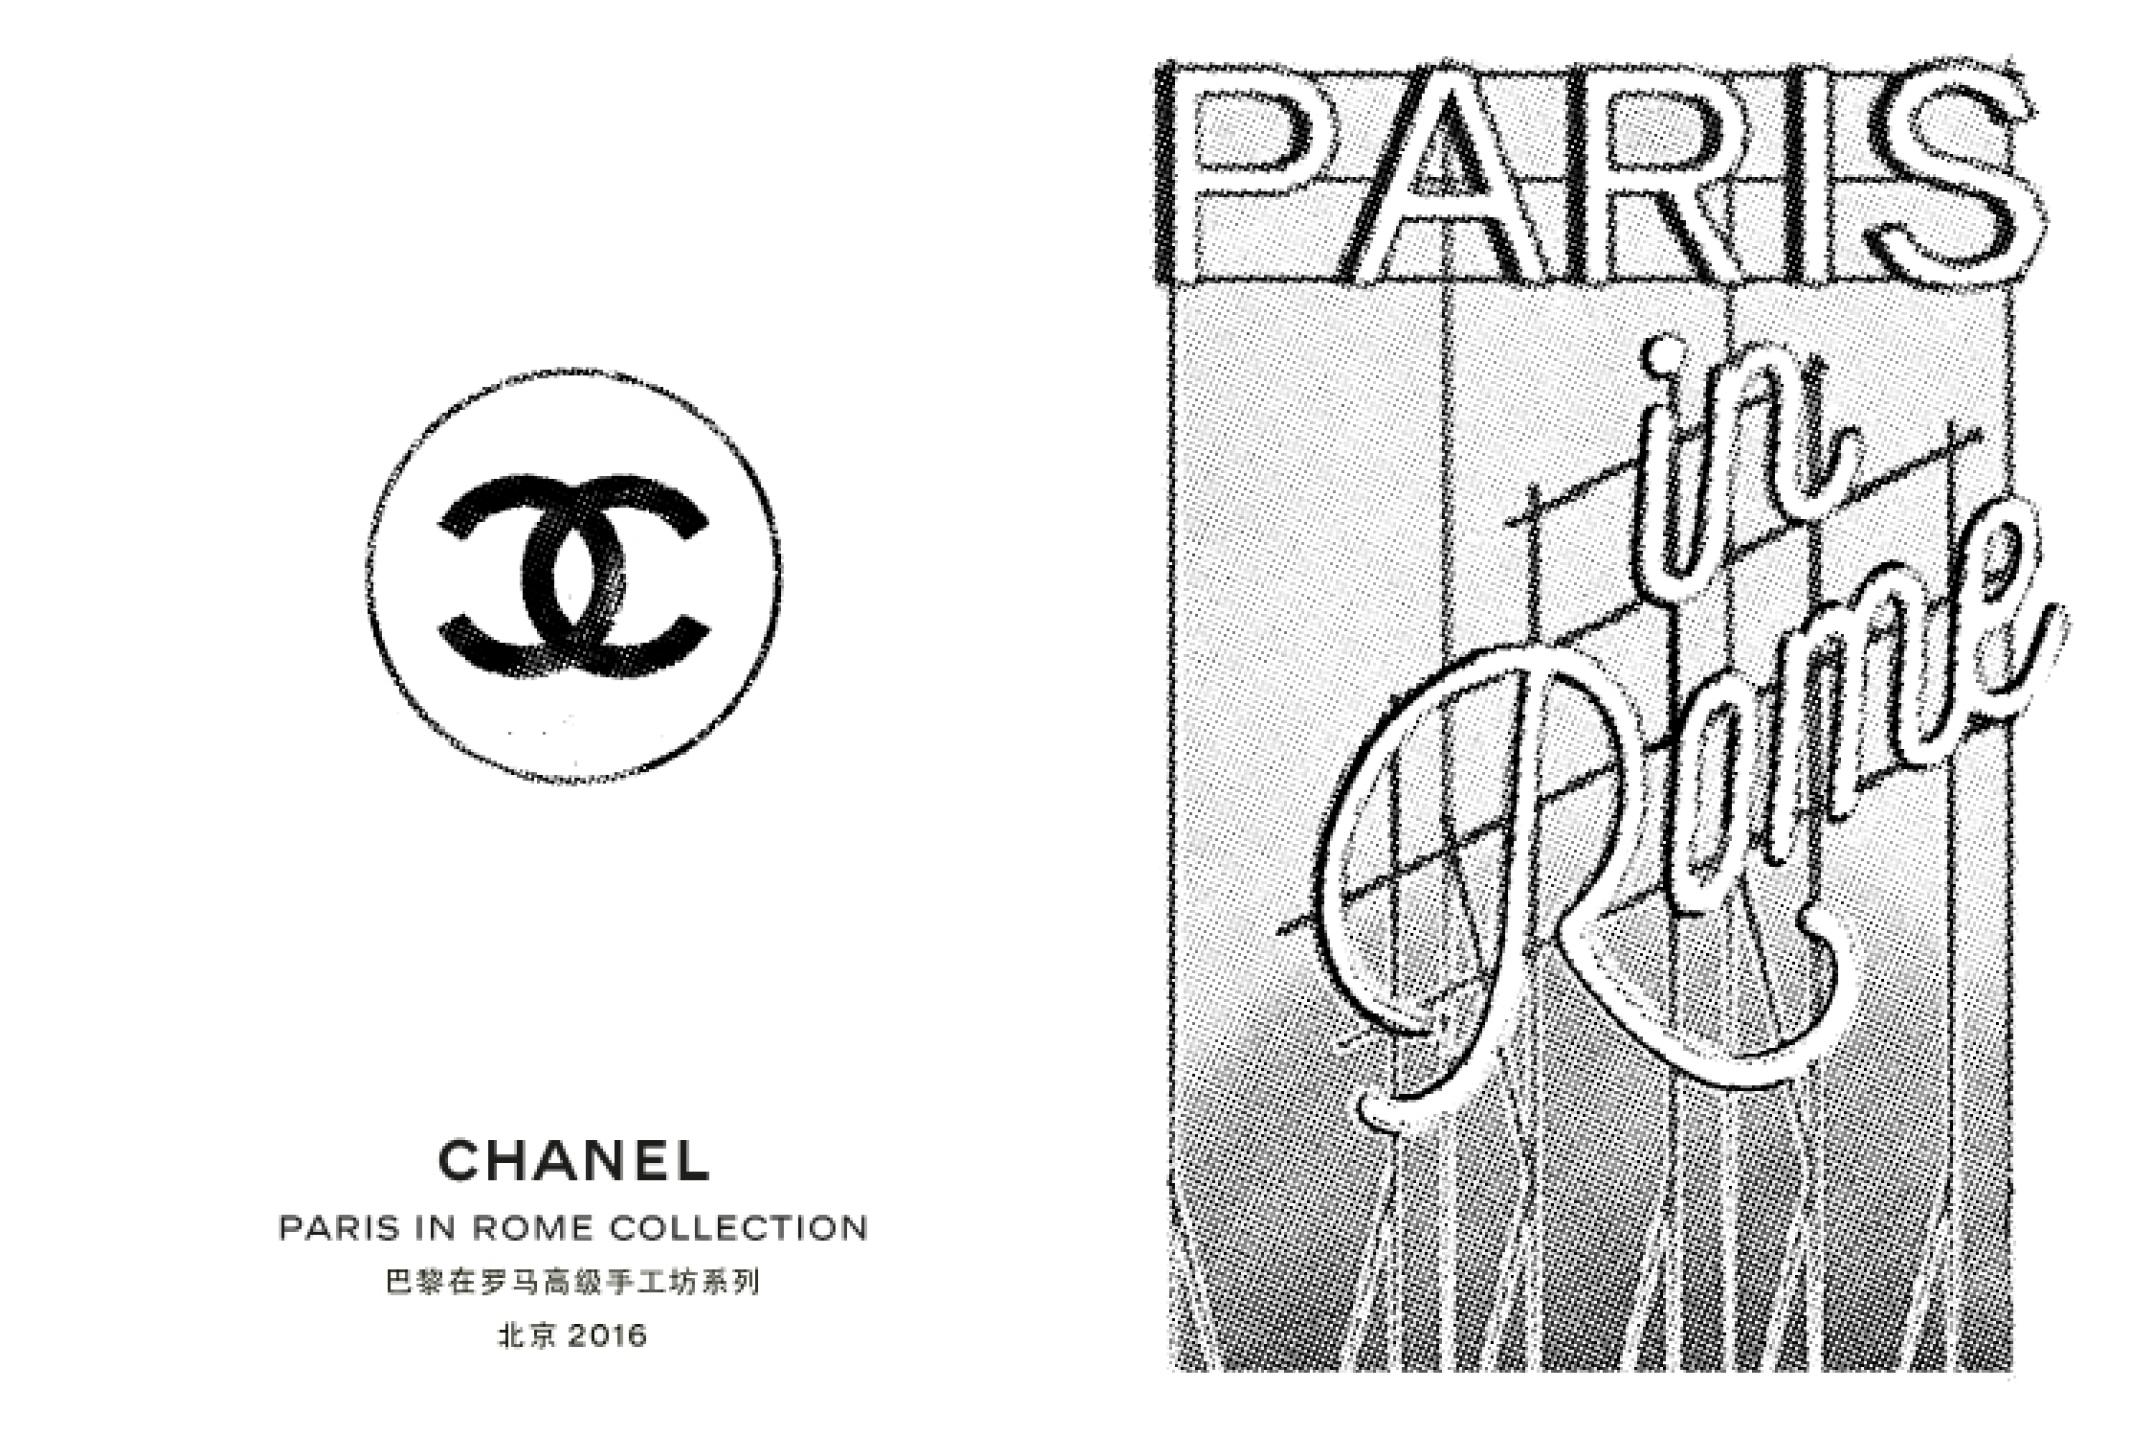 CHANEL Paris in Rome Beijing Replica Show